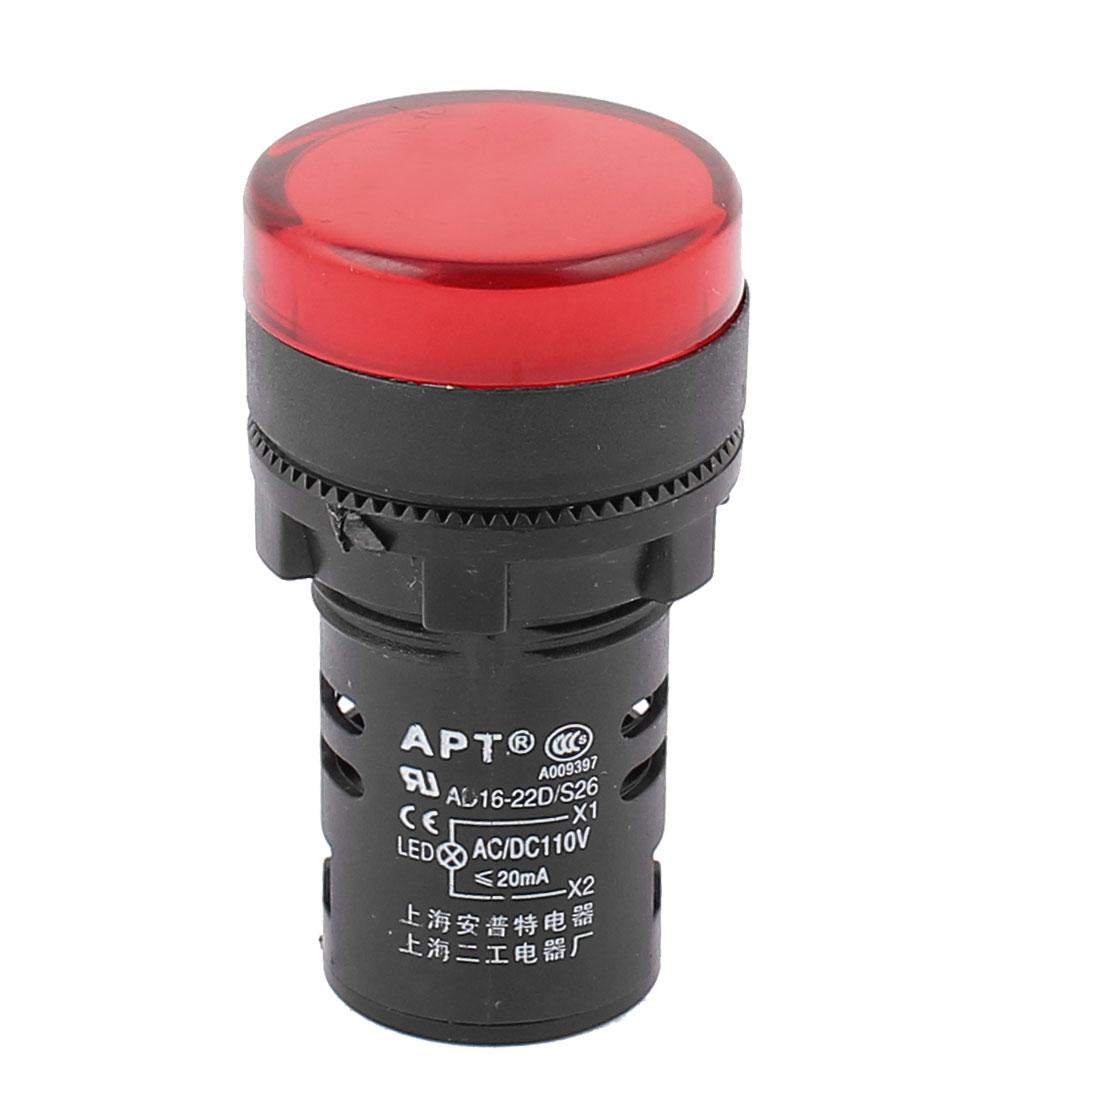 AC/DC 110V 20mA 22mm Thread Diameter Red LED Pilot Panel Indicator Light